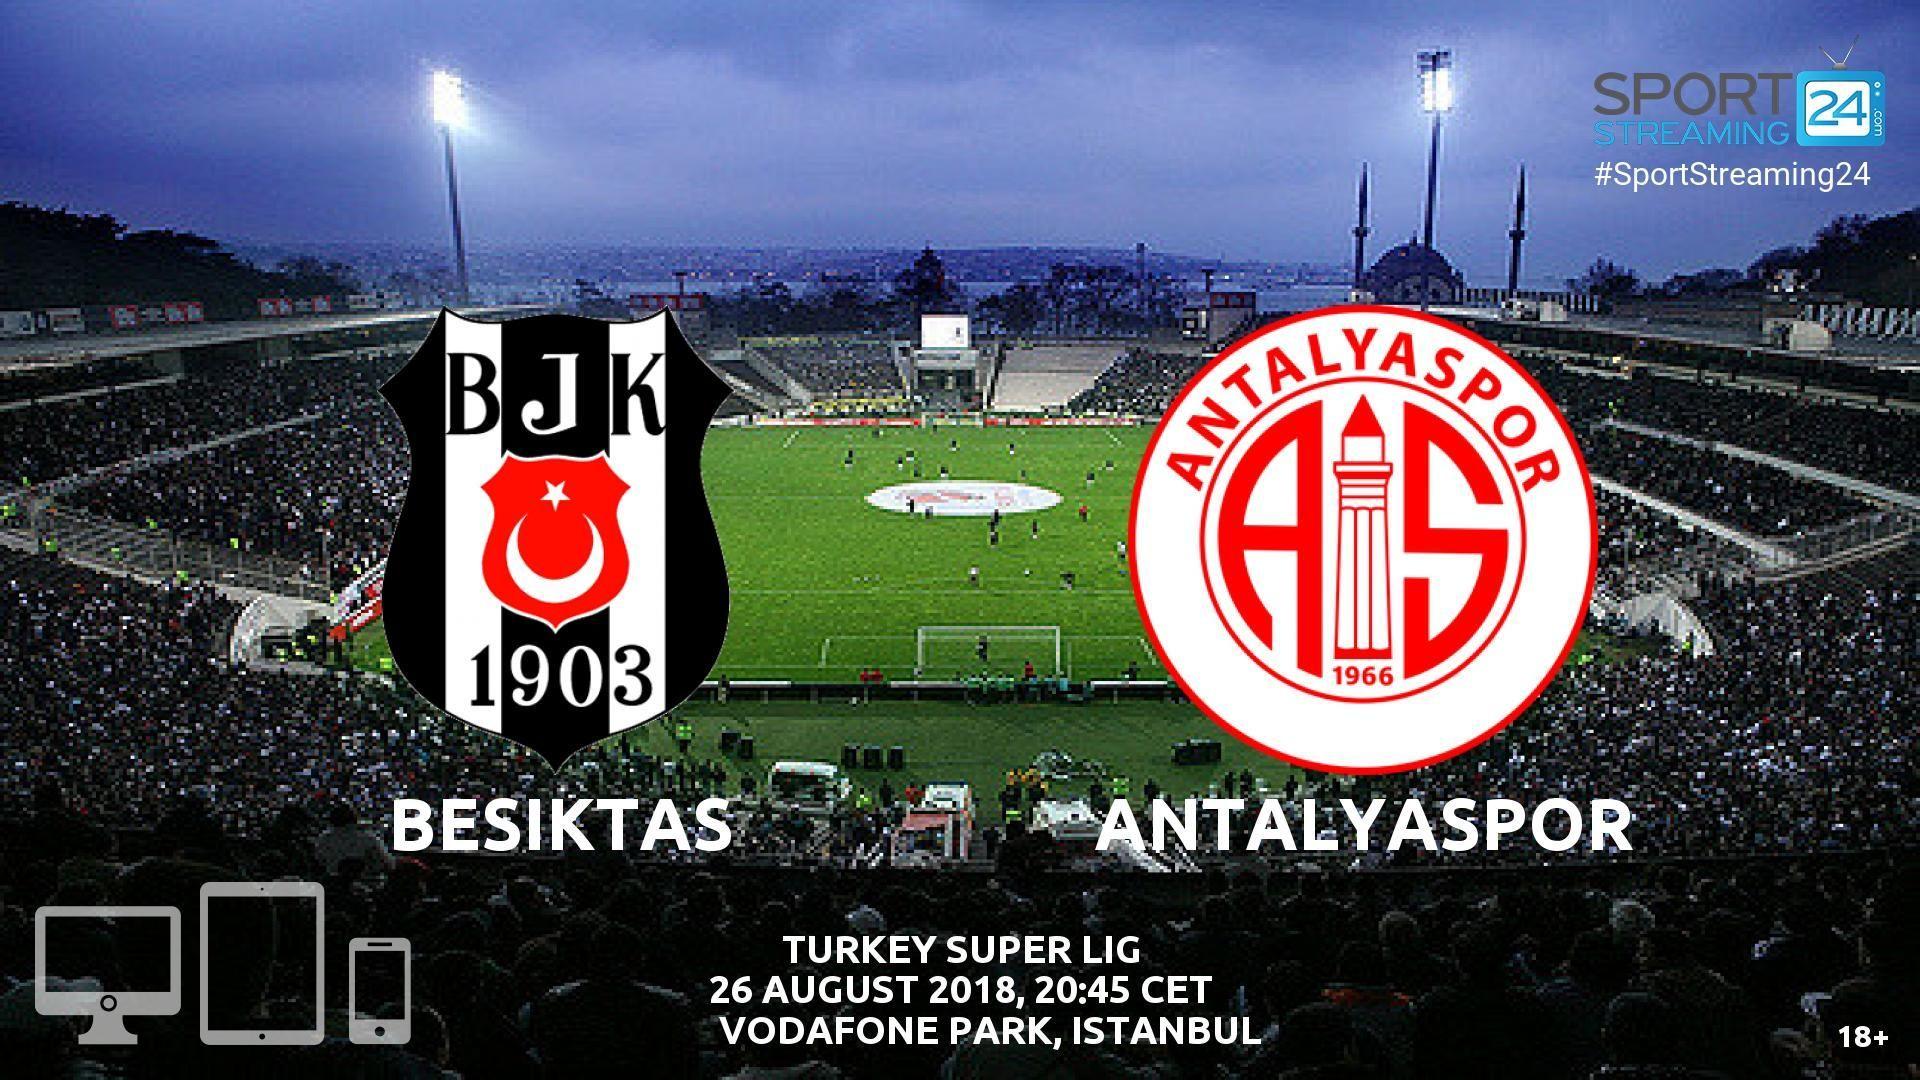 Besiktas v Antalyaspor Live Streaming Football Chicago